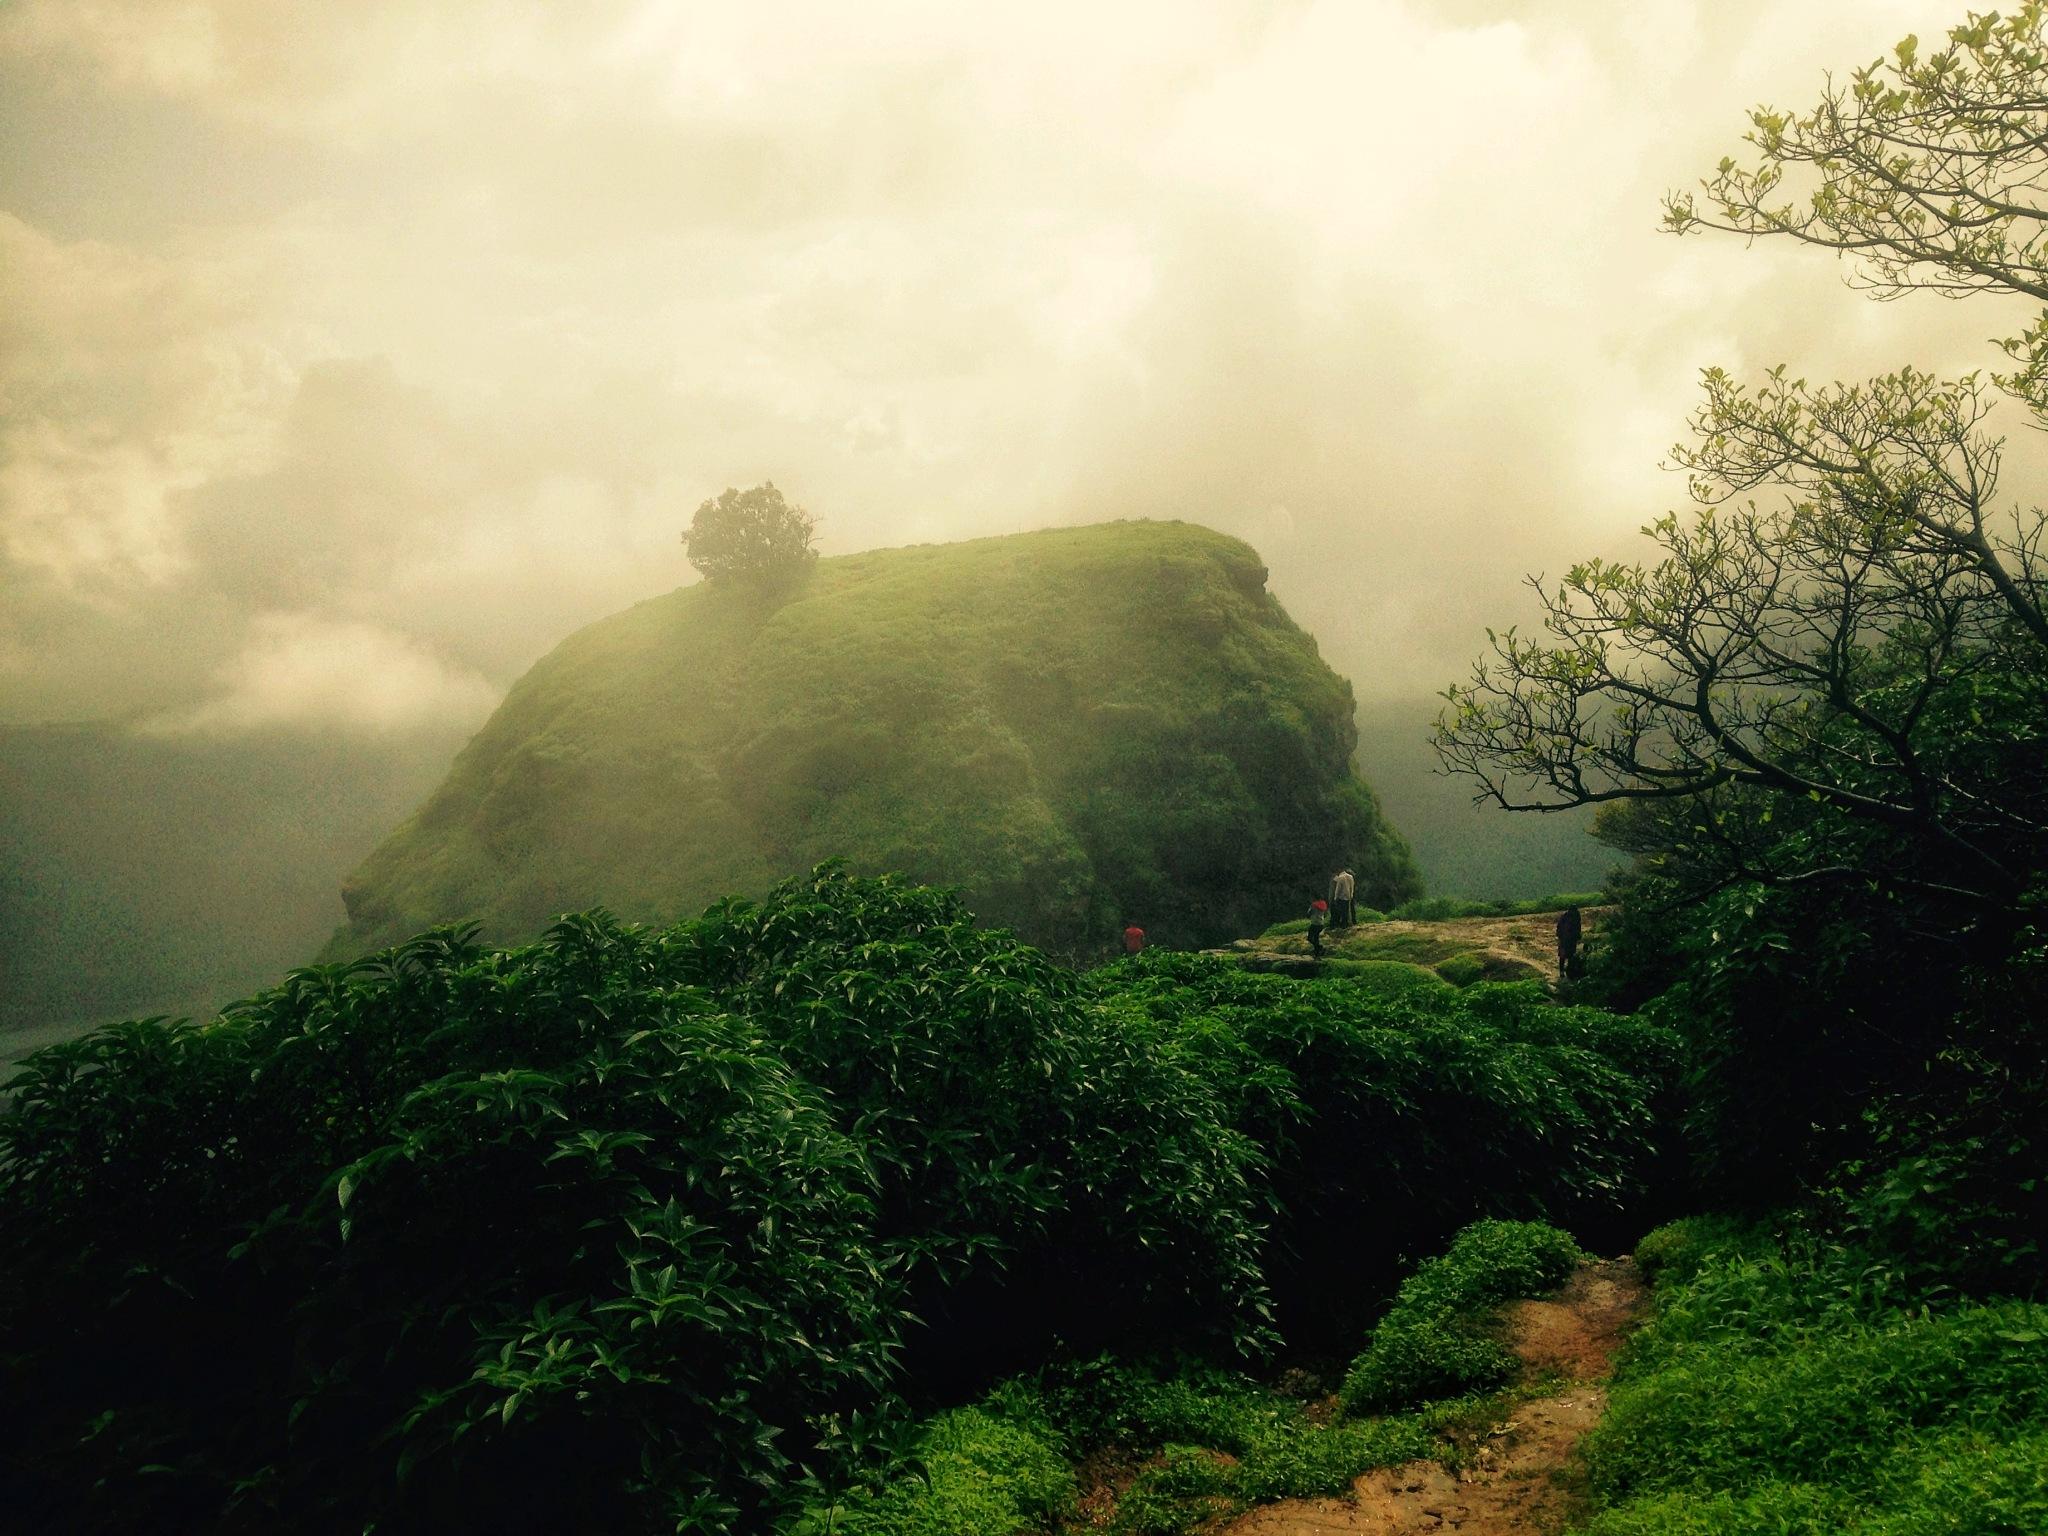 Dreamland by Shruti